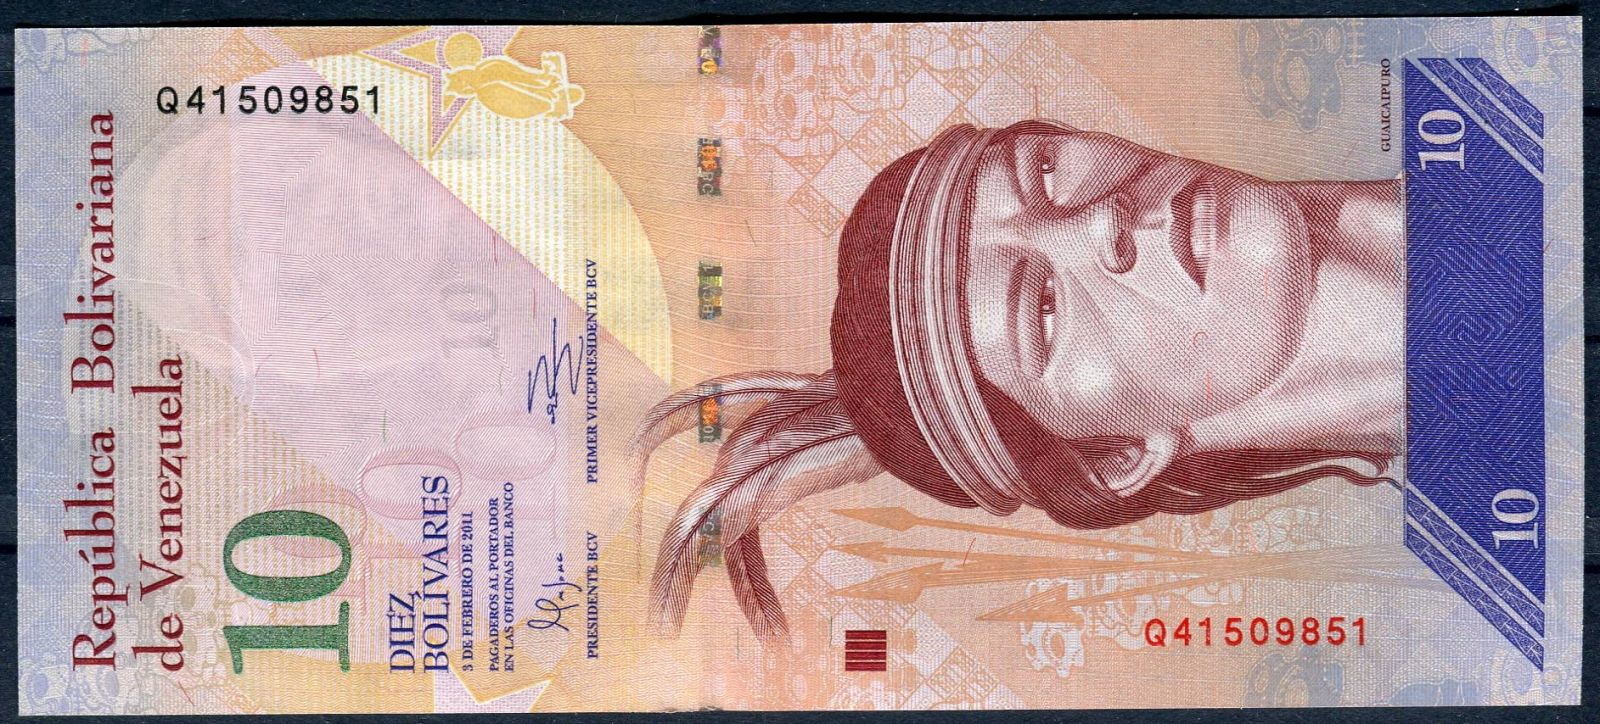 Bankovka 10 bolivares Venezuela - vydání 3.2.2011 - UNC   www.tgw.cz